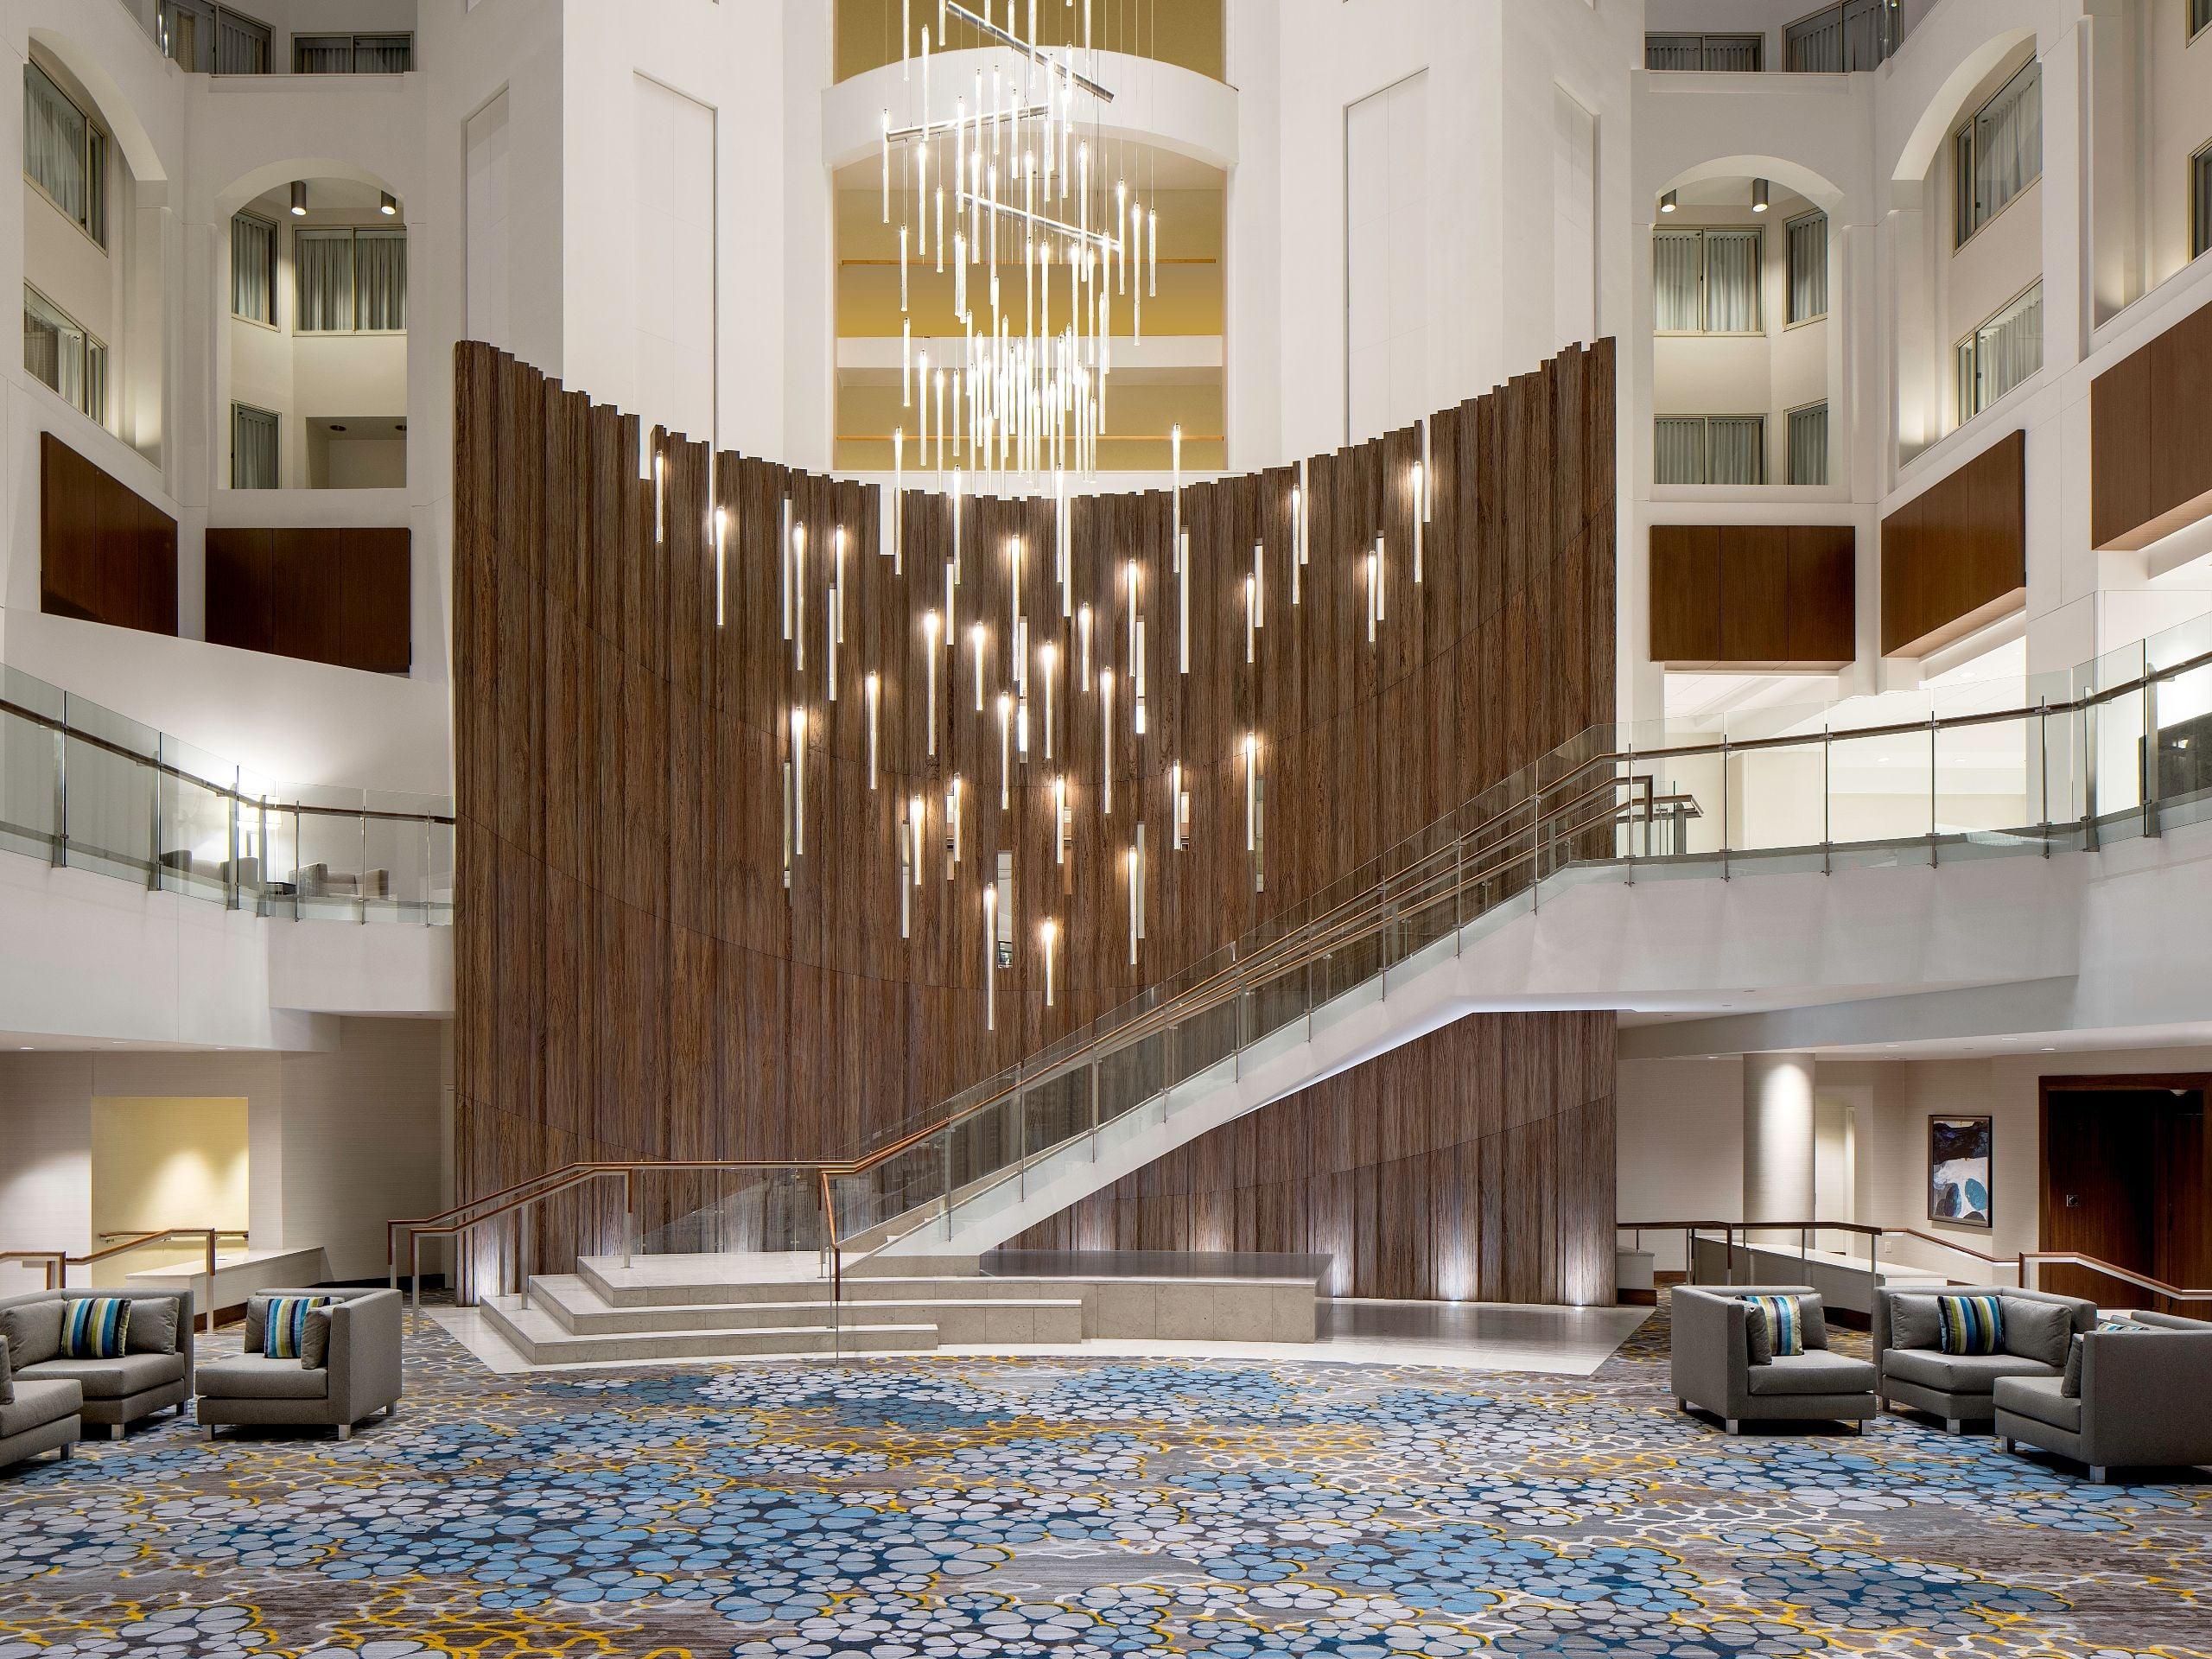 luxury washington dc hotel grand hyatt washington rh hyatt com grand hyatt washington dc parking grand hyatt washington dc parking